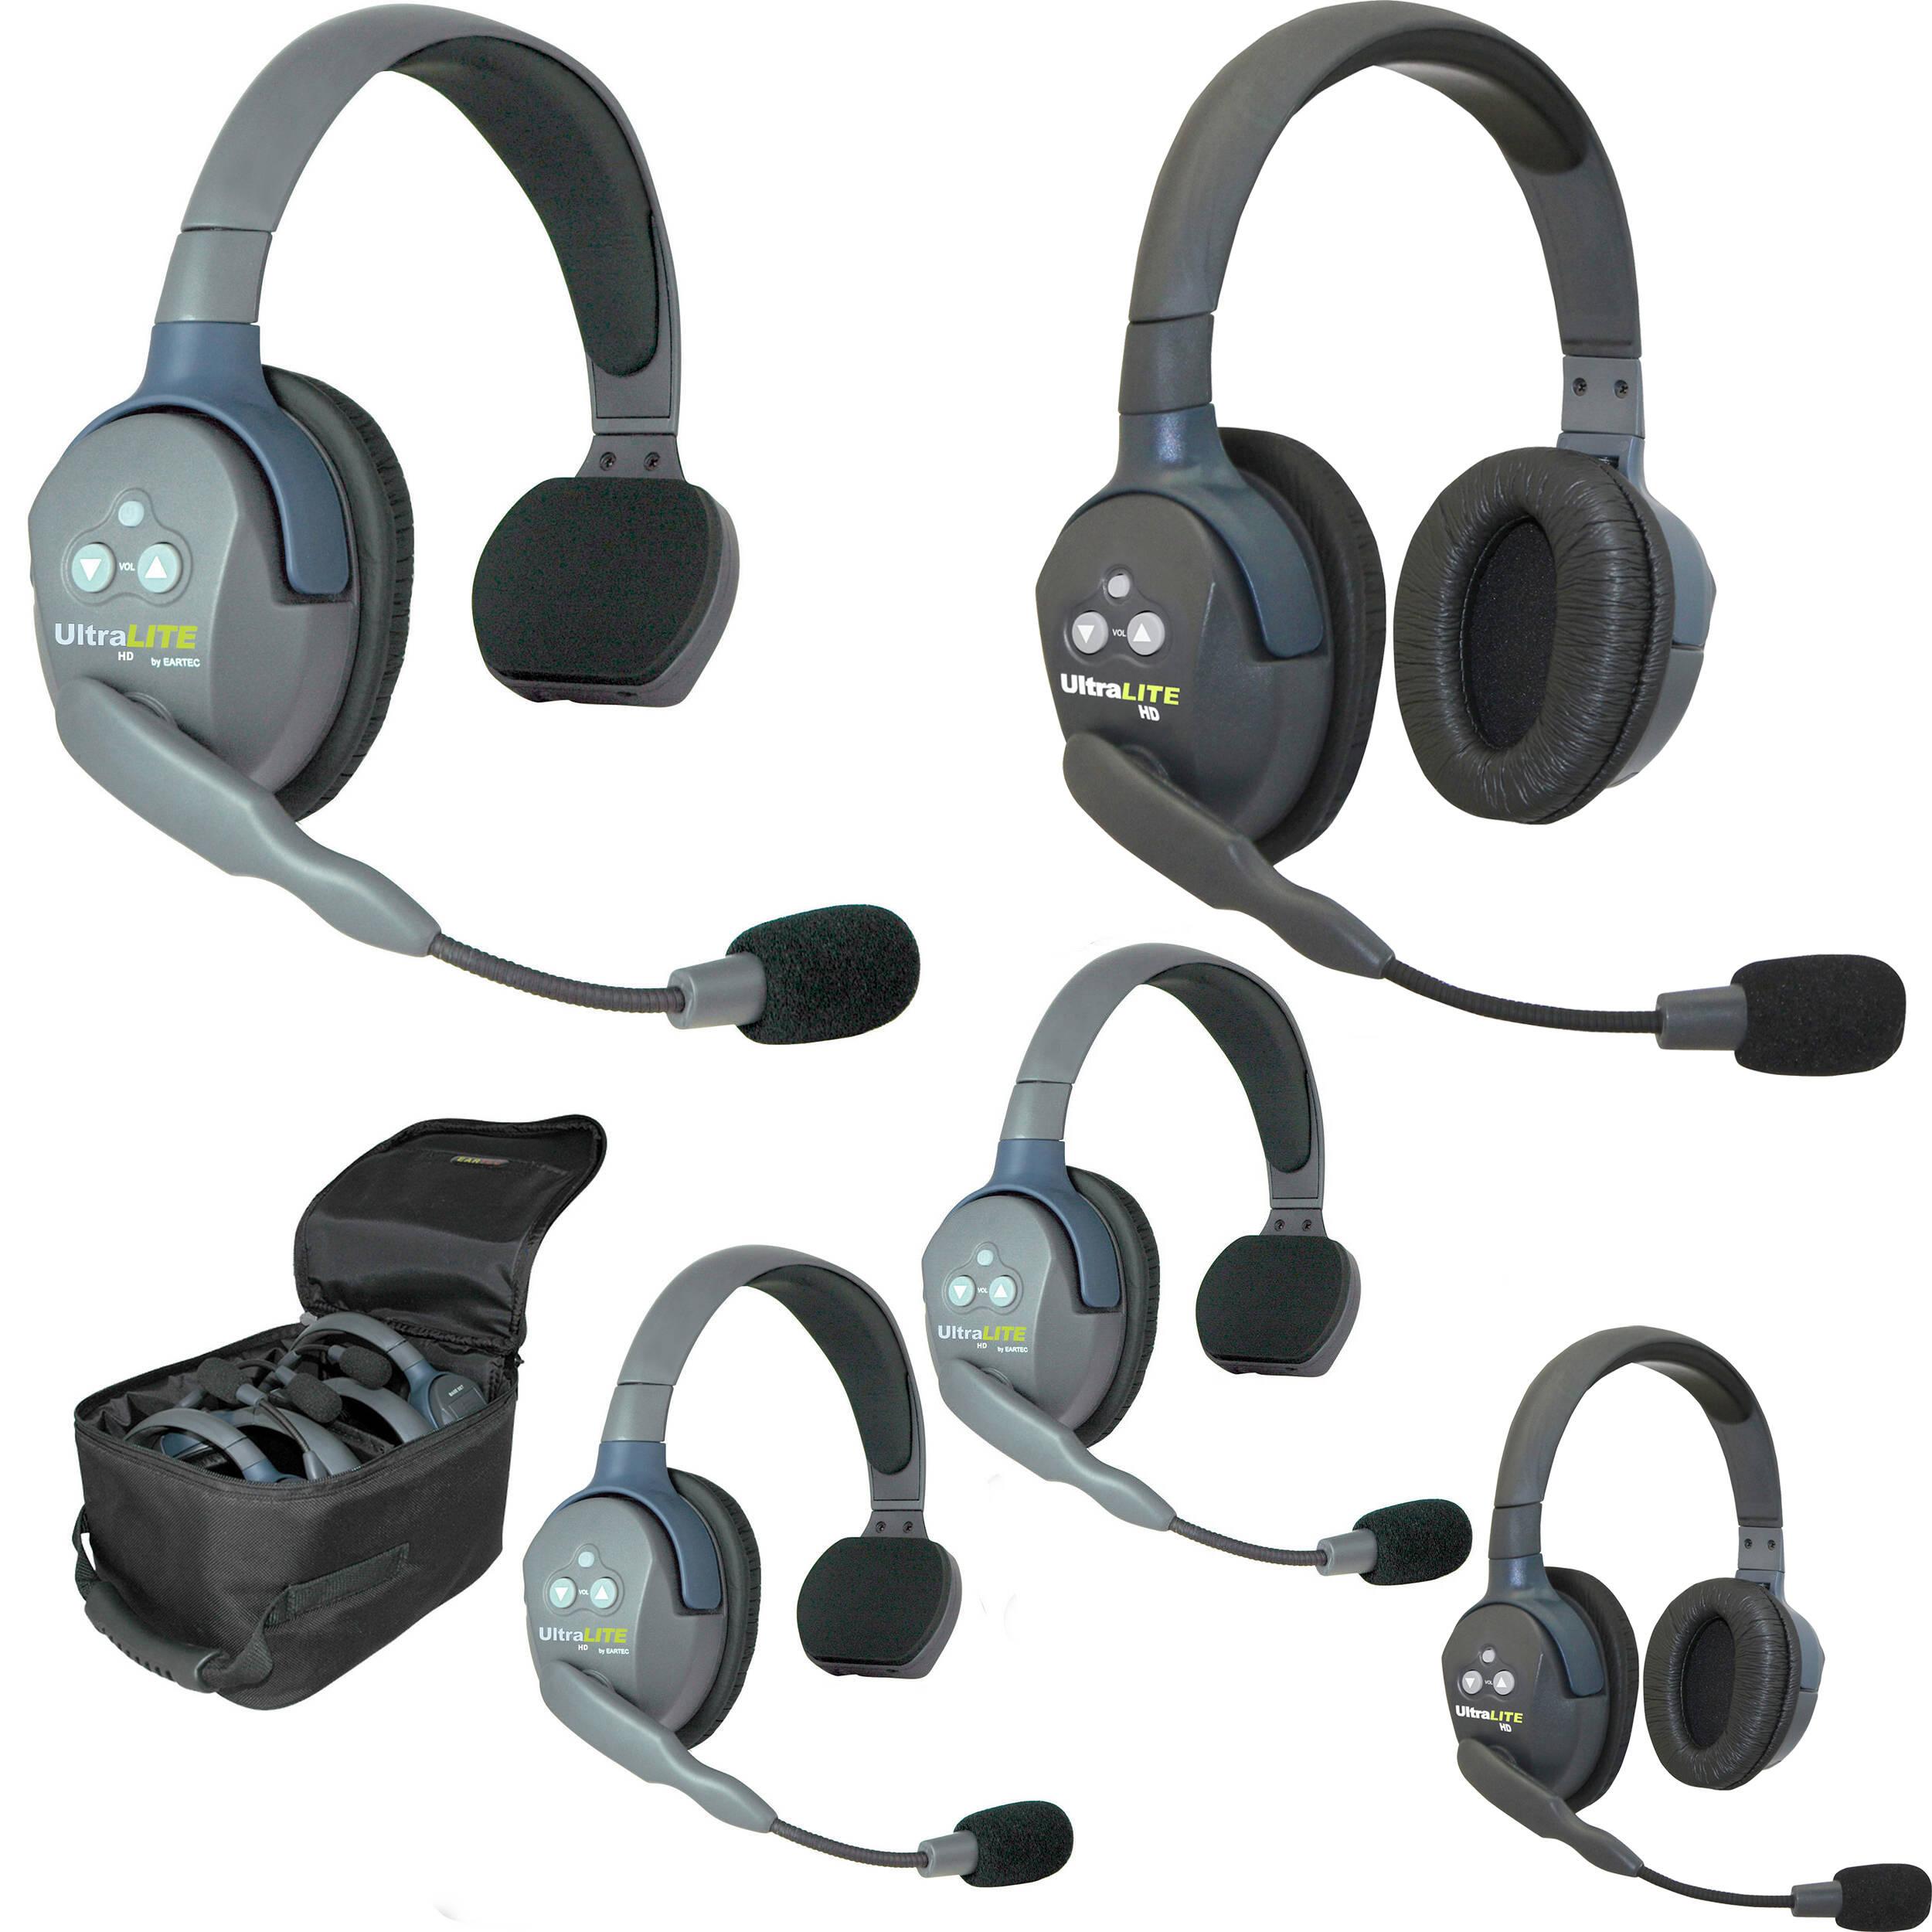 Eartec Ul532 5 Person Full Duplex Wireless Intercom With 3